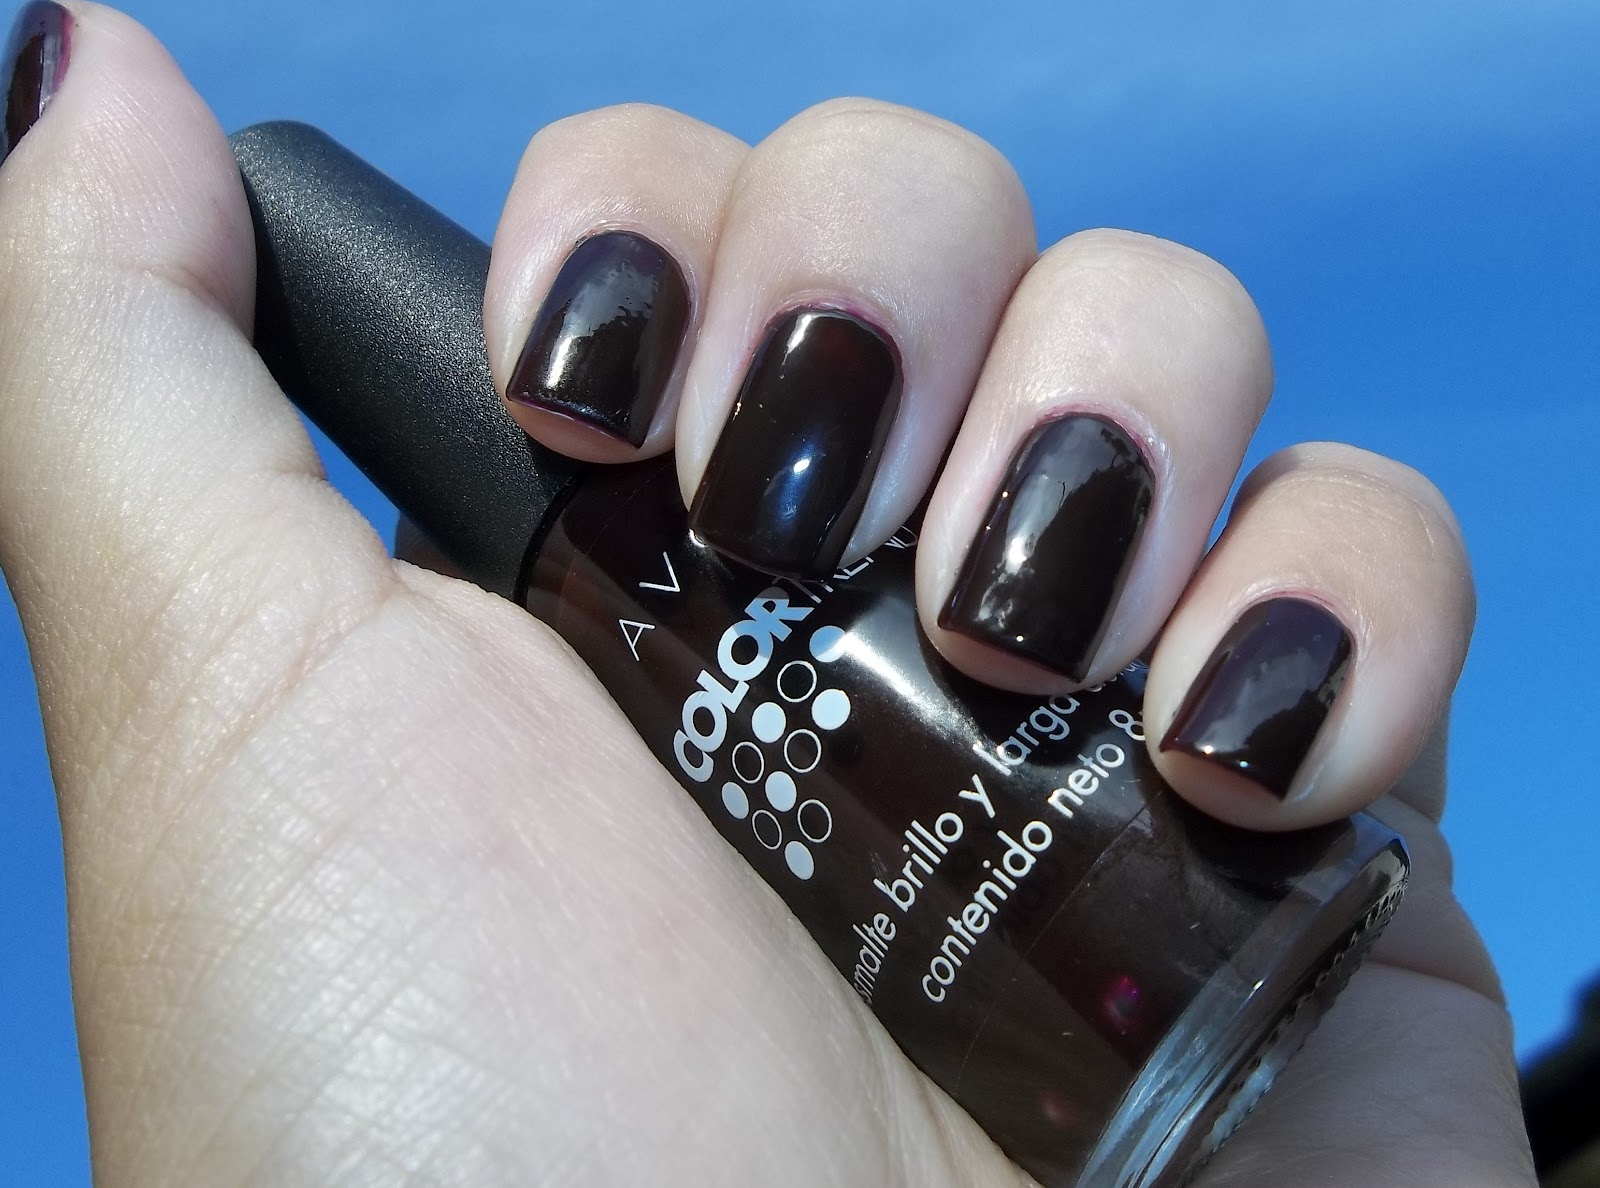 miss phibes.: Avon Color Trend Morado Oscuro / Casi negro